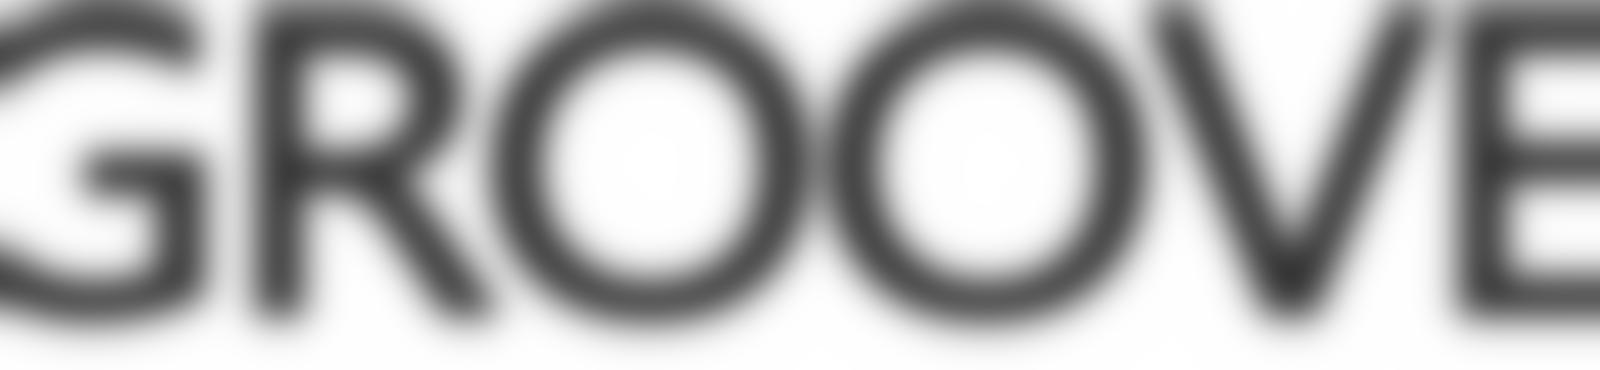 Blurred 06559b85 6a39 49d8 ad5e 45ec17e5f430